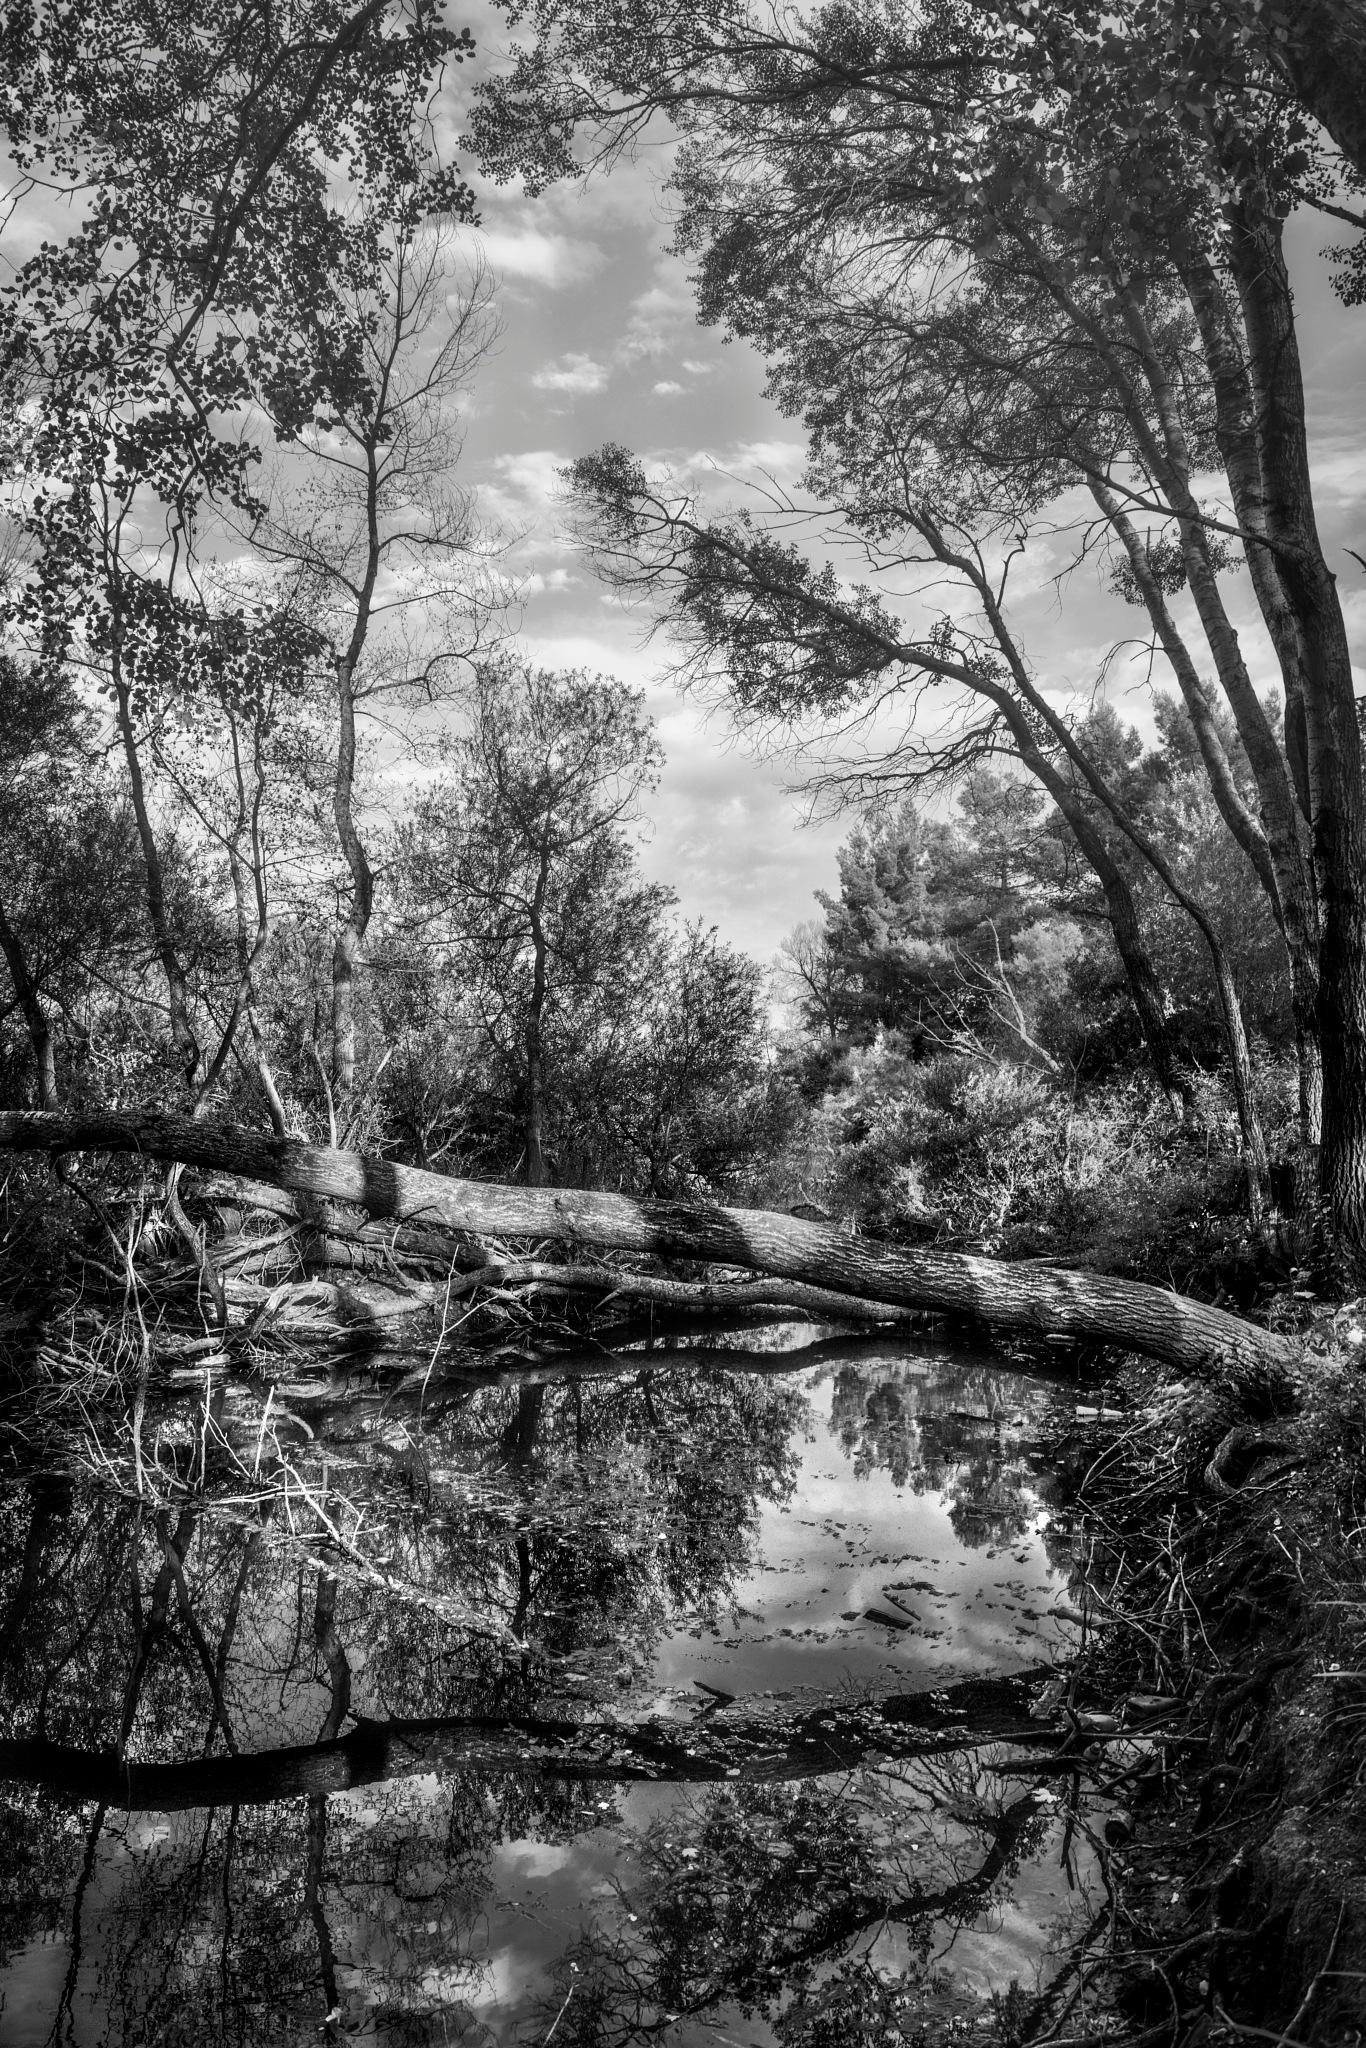 swamp by Stathis Floros